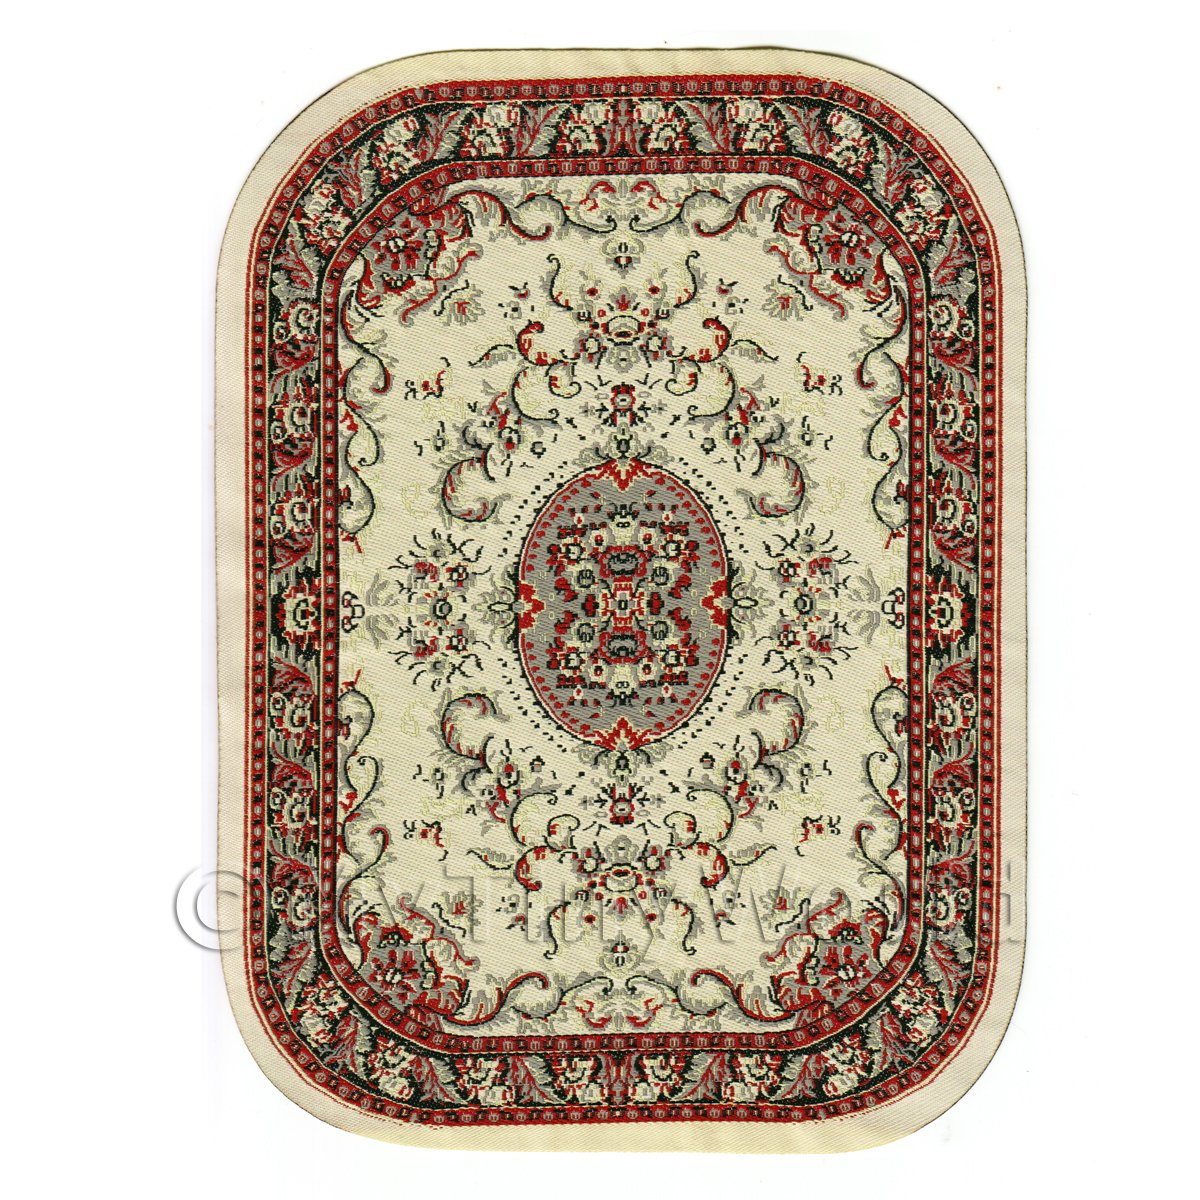 Large Oval Area Rugs: Dolls House Miniature Large Oval Victorian Carpet / Rug